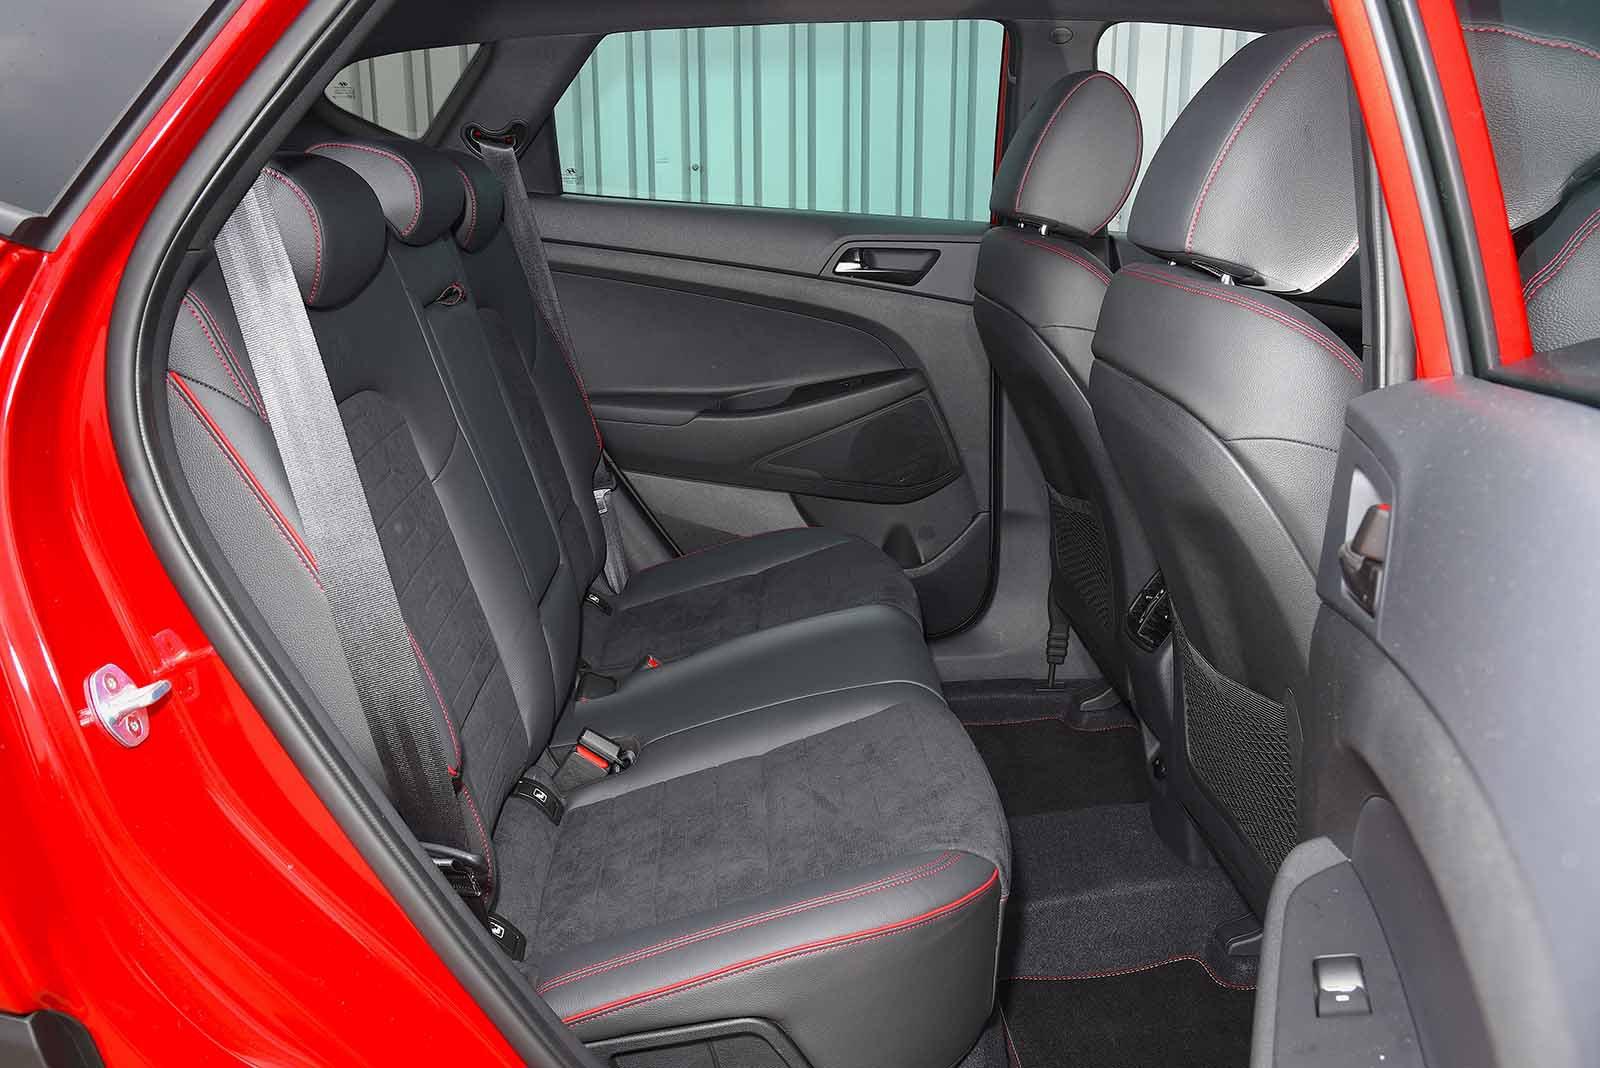 Hyundai Tucson N Line 2019 rear seats